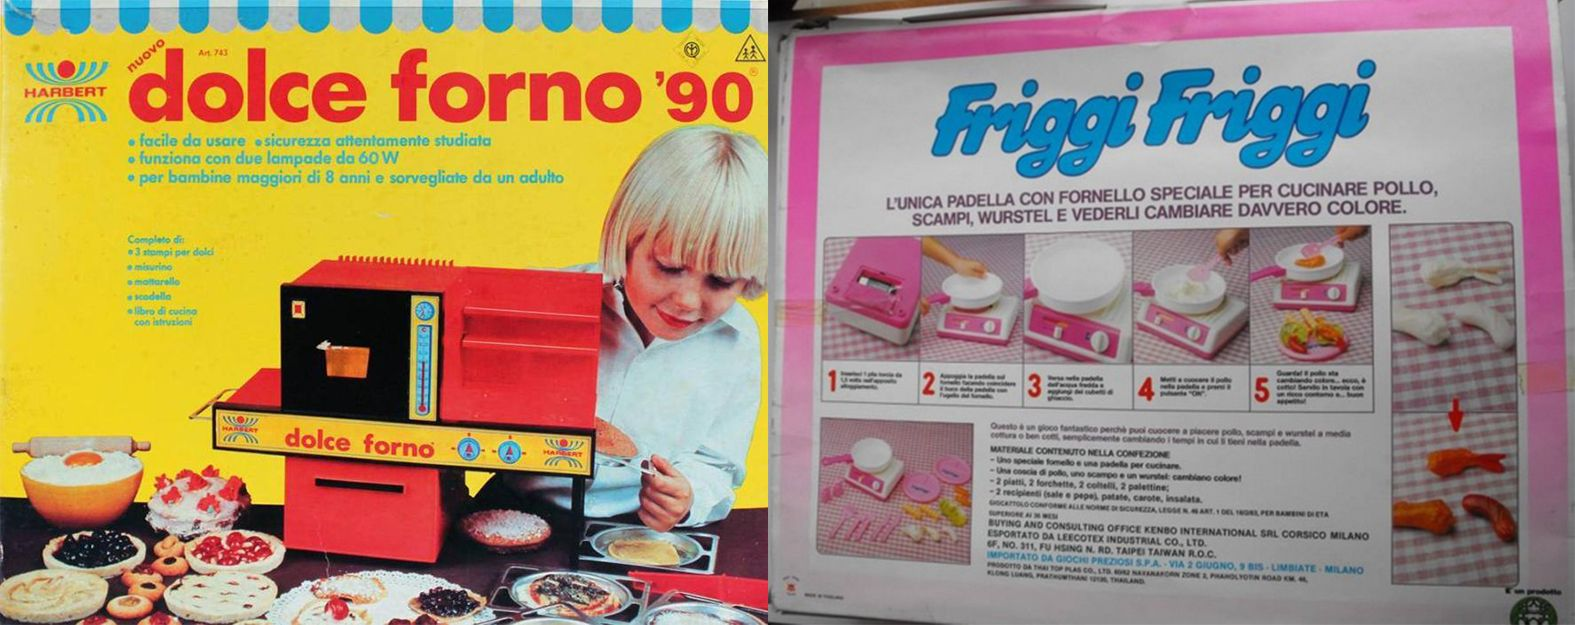 dolce_forno2_941-705_resize copy